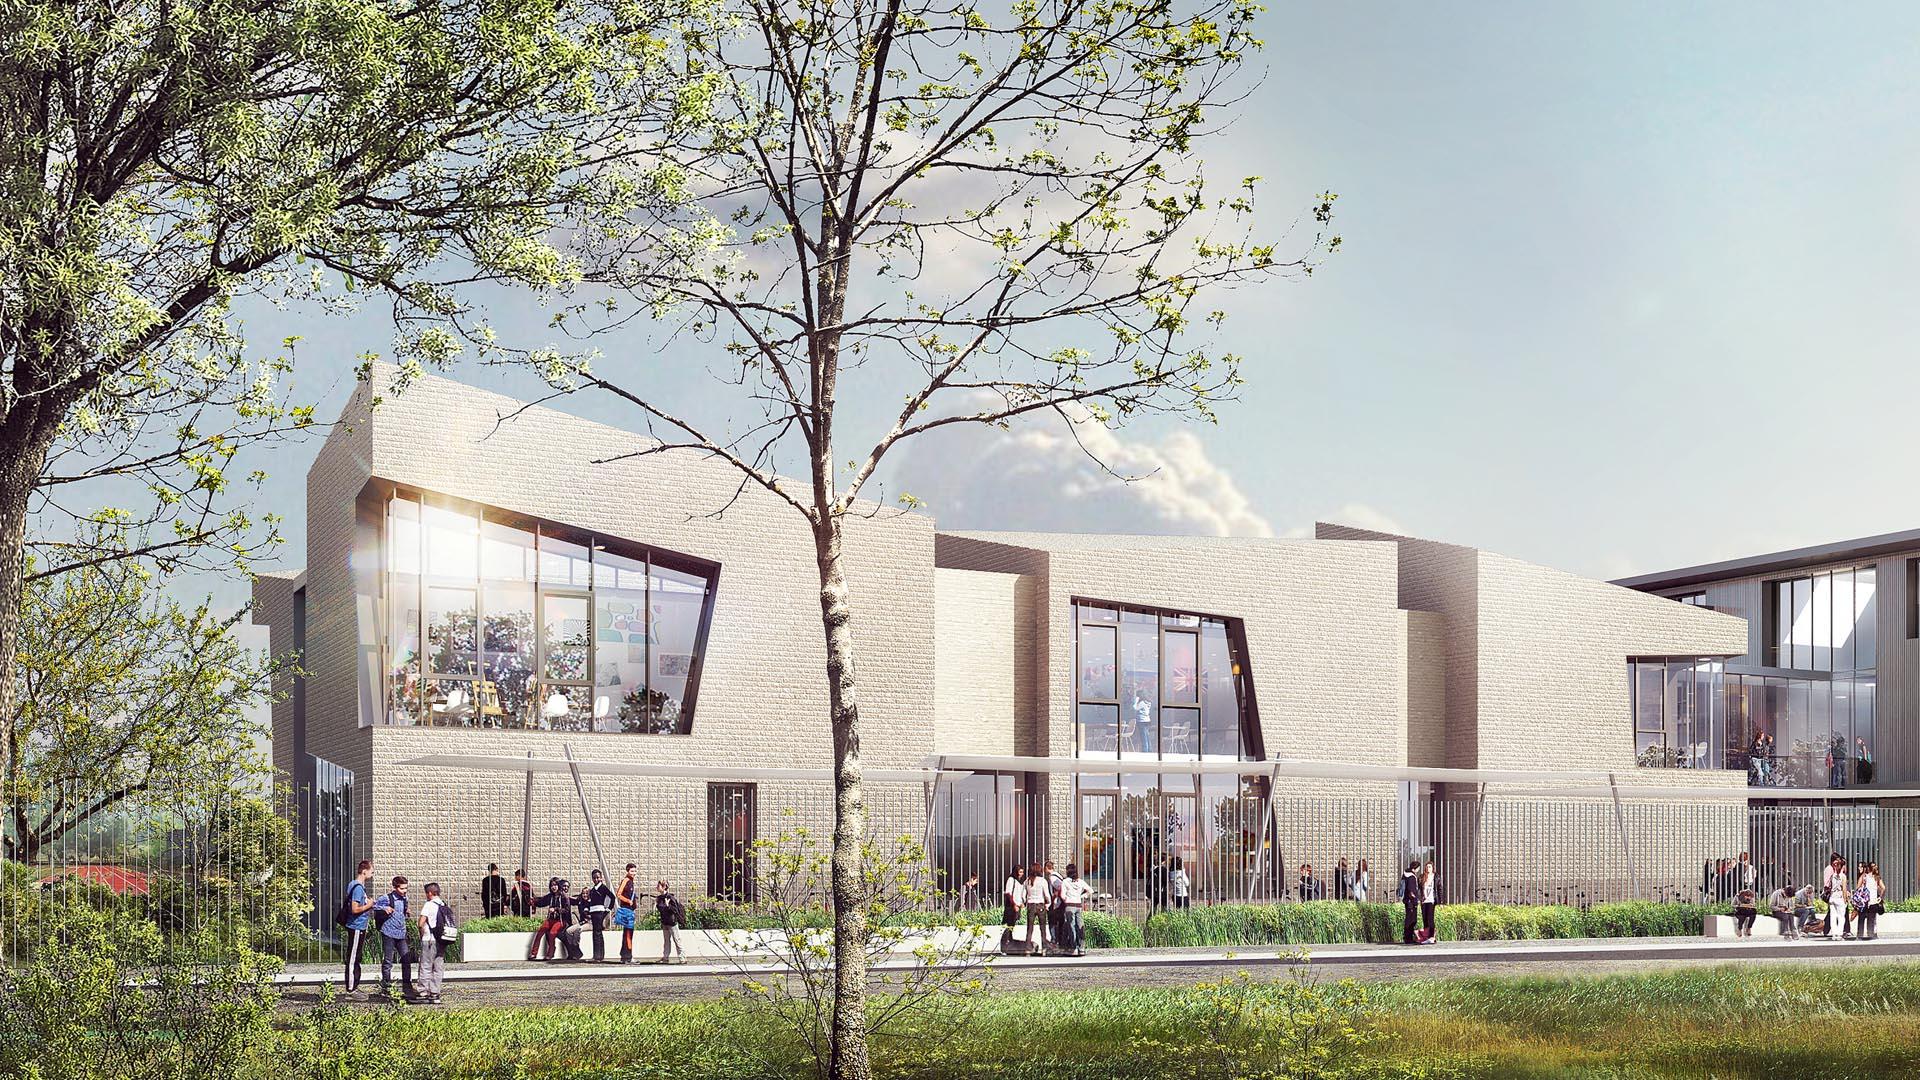 Seuil-architecture-Construction-College-St-Simon-07